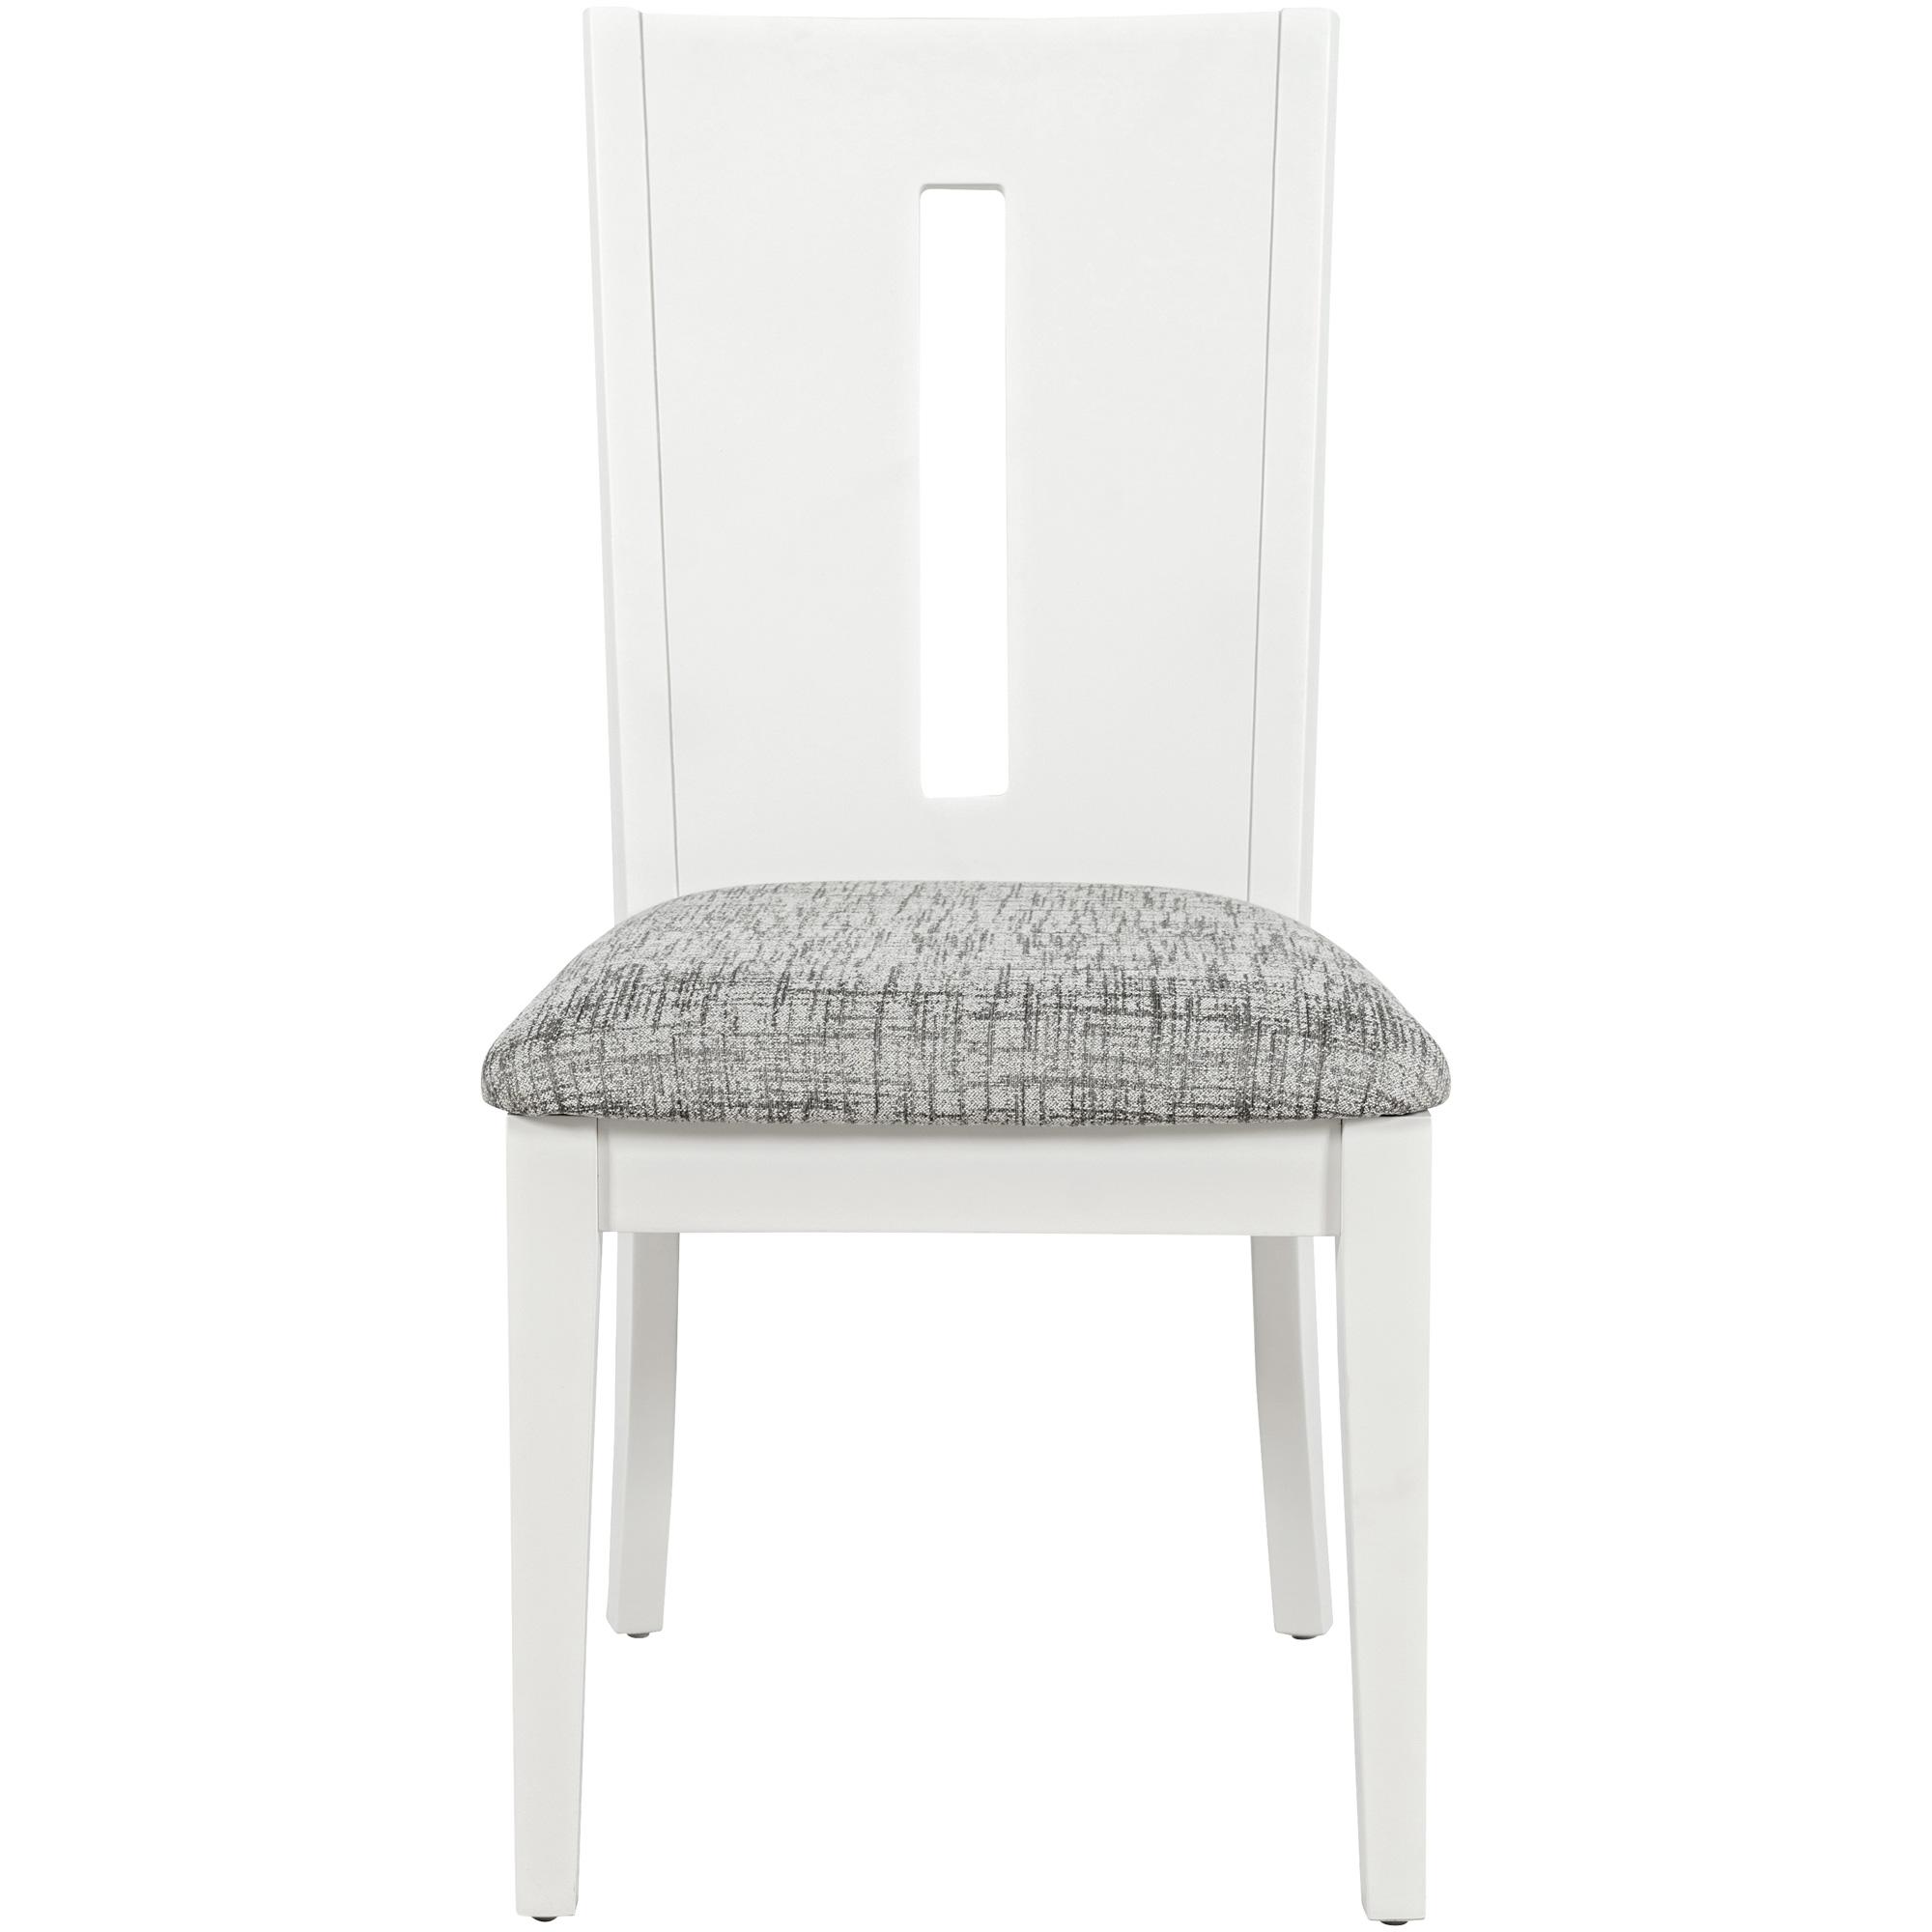 Jofran, Inc. | Urban Icon White Dining Chair